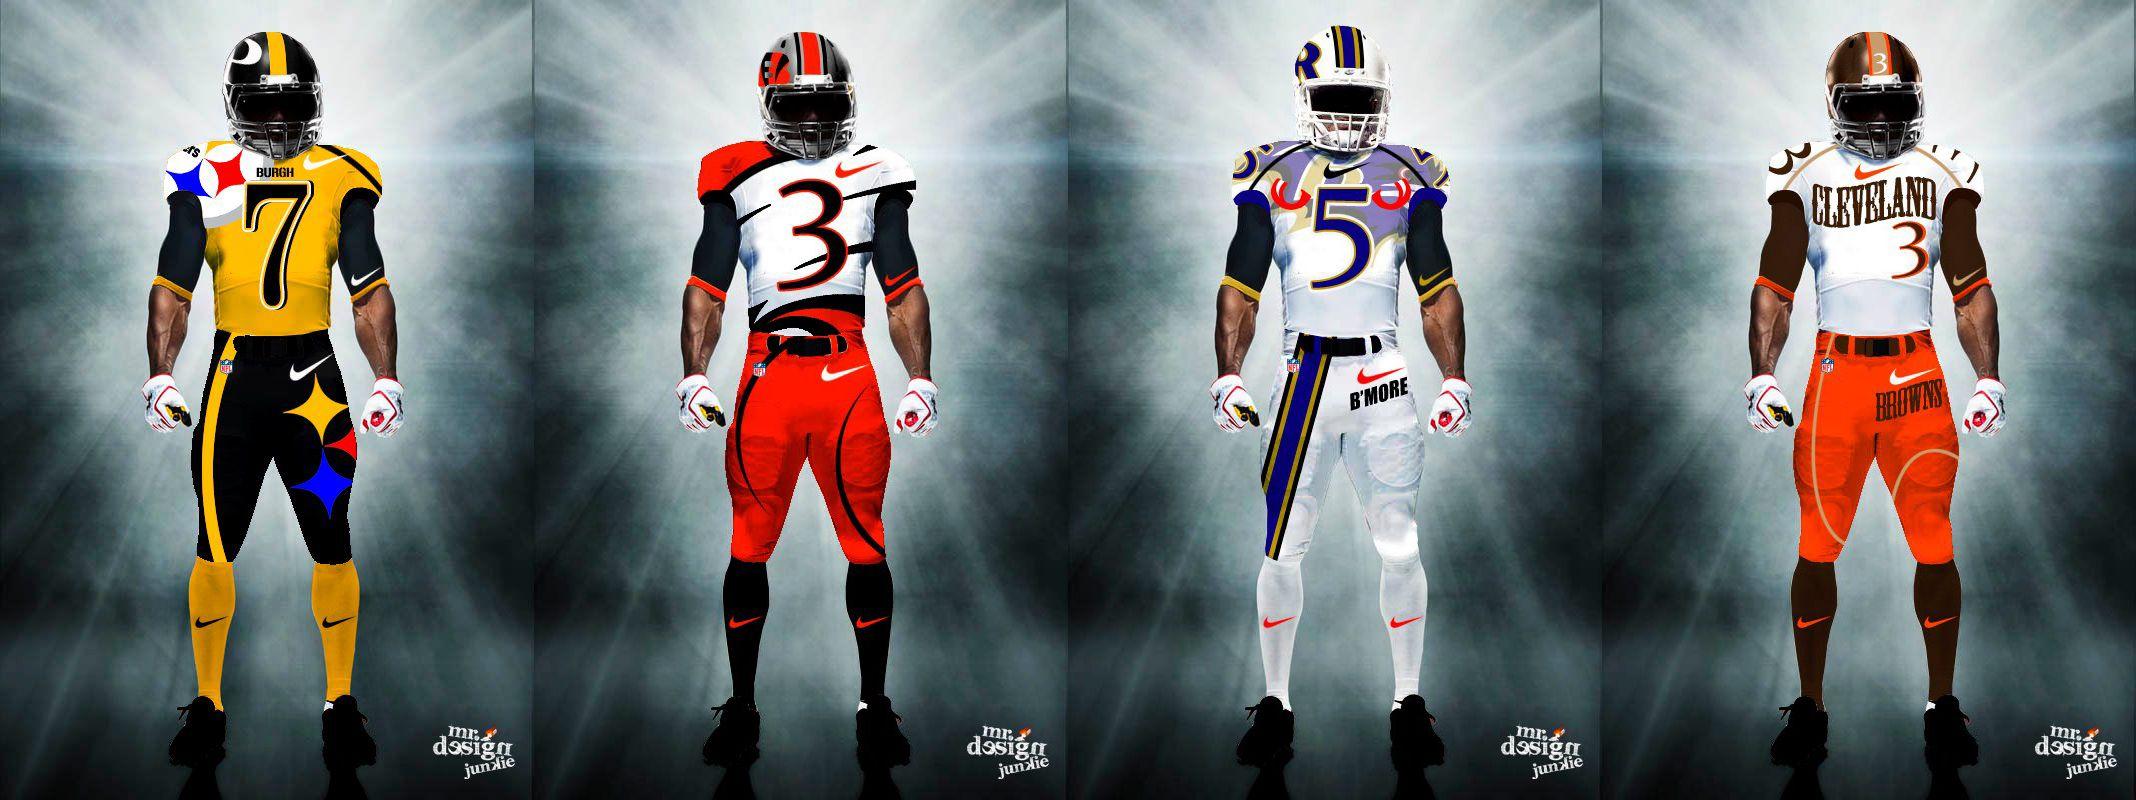 981188968 AFC North Uniforms- http   www.fantasyhelp.com 2014